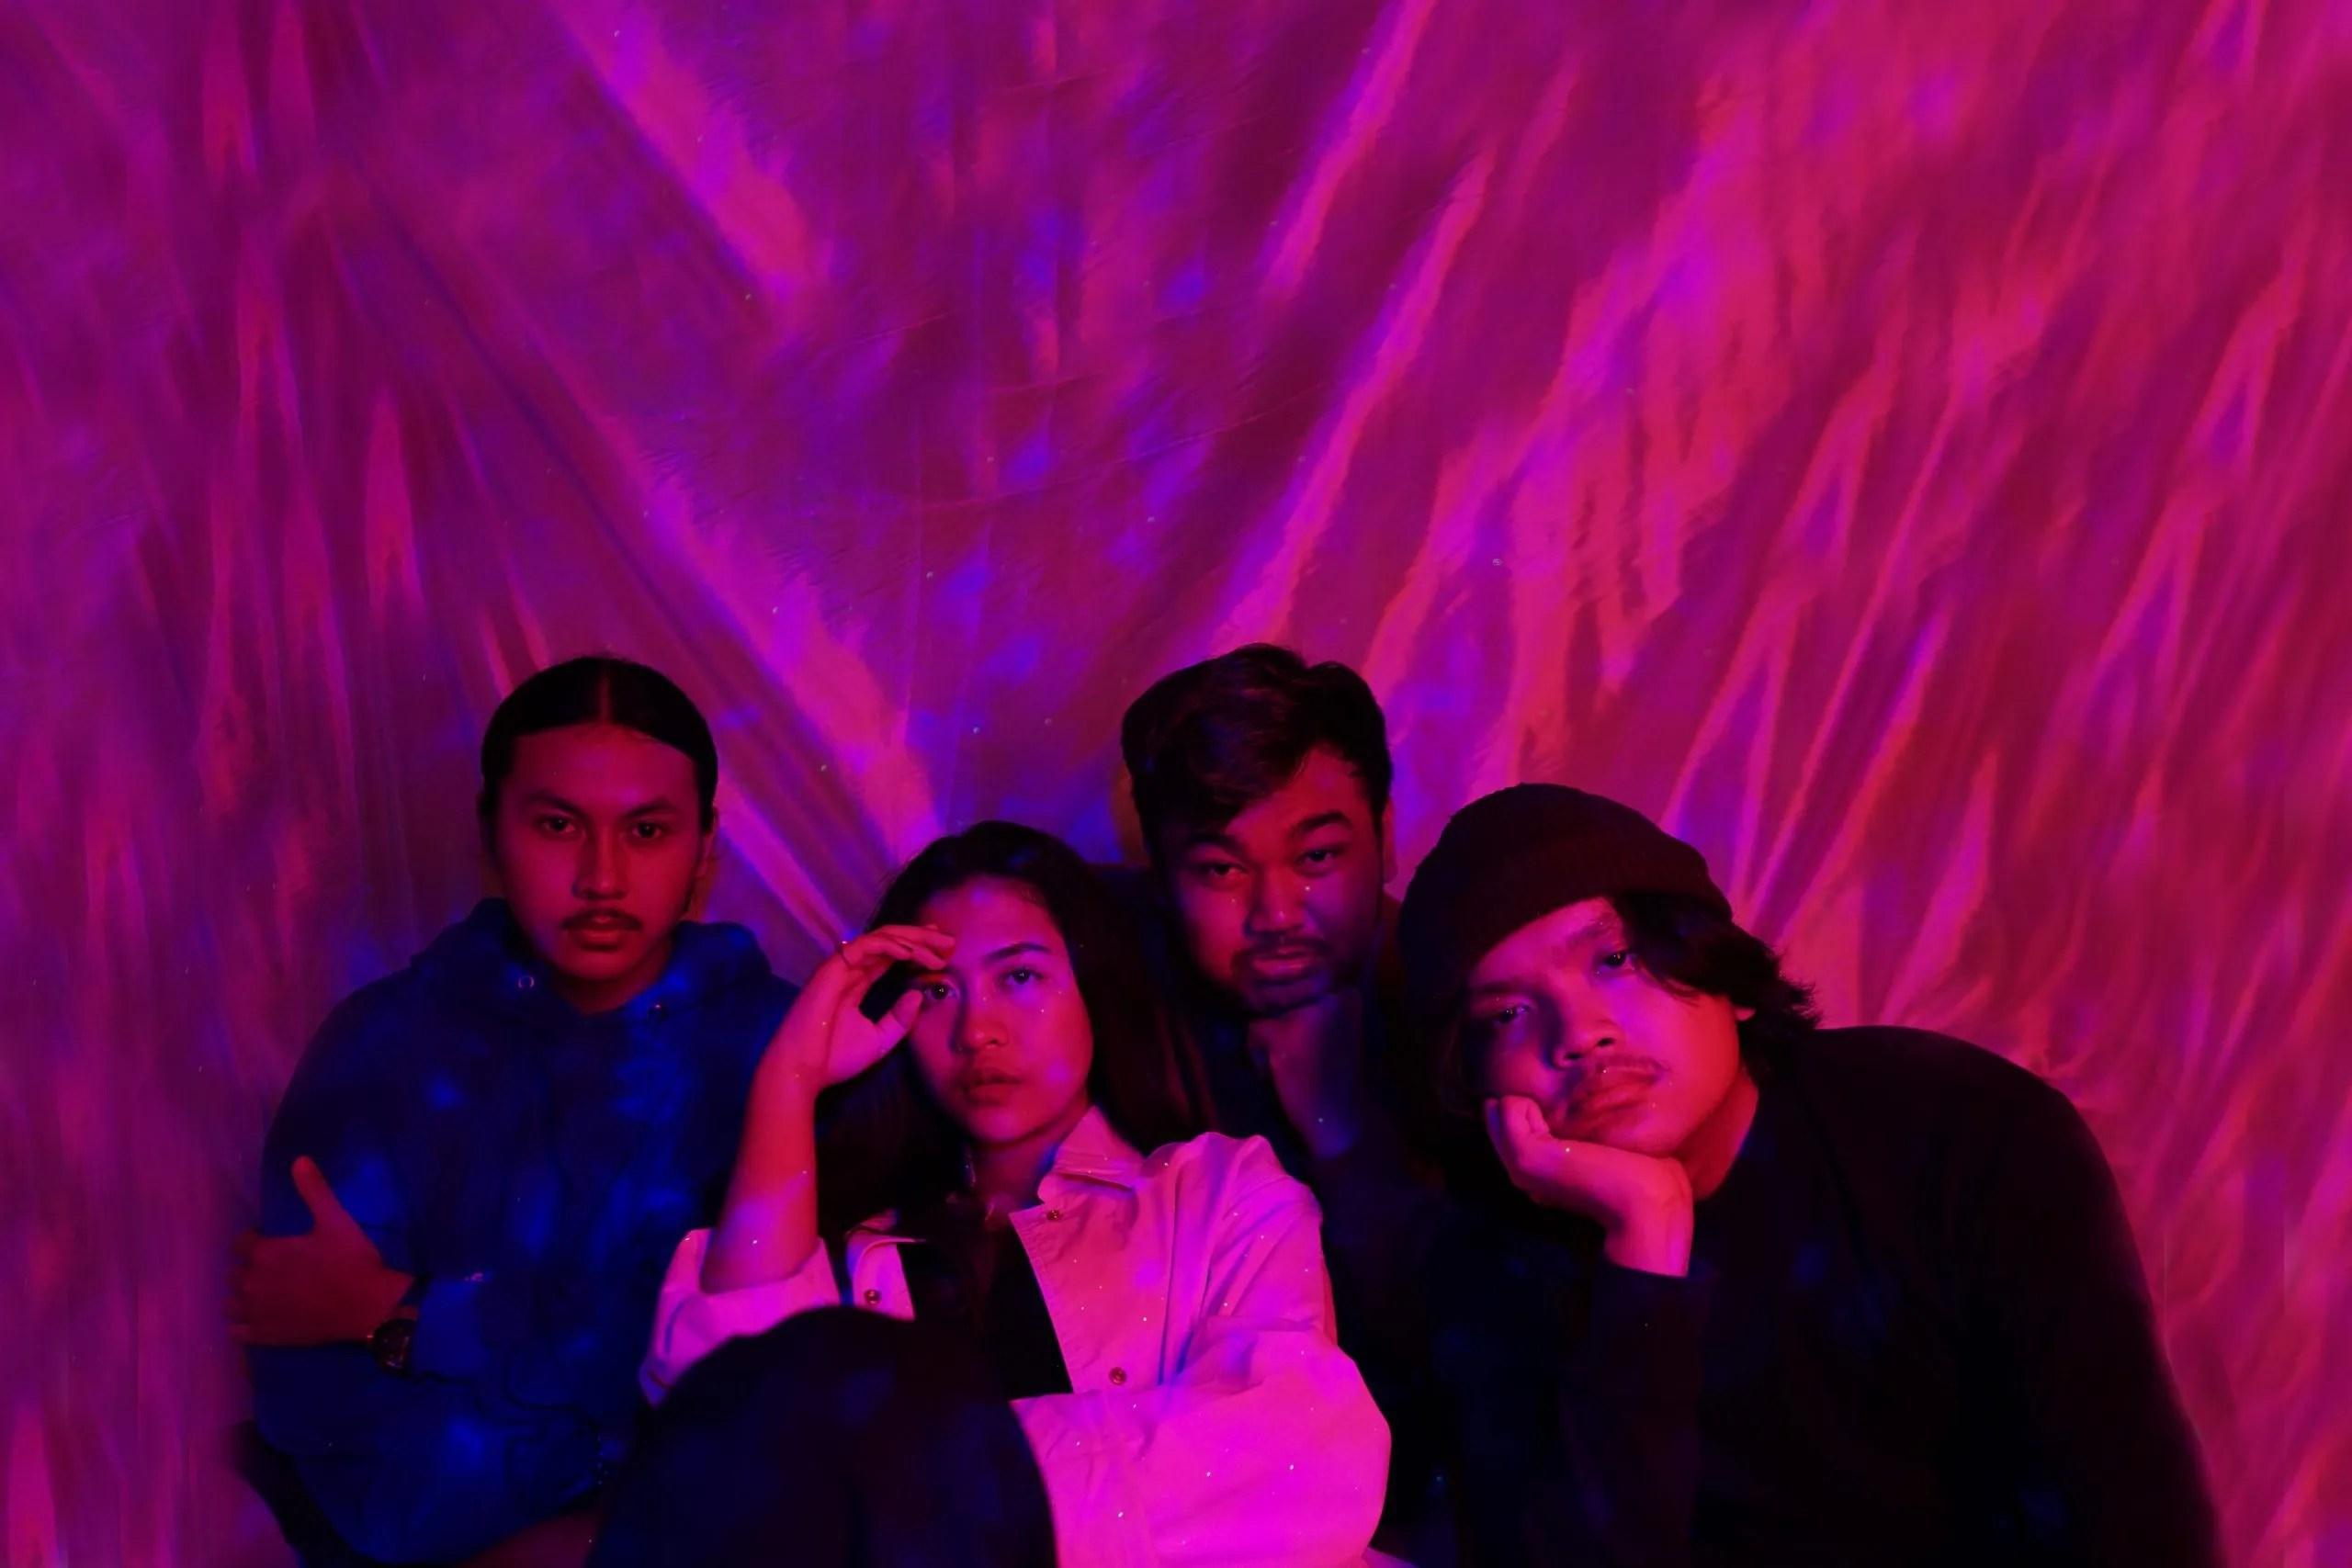 Jakarta's Alternate Pop Band Brings Refreshing Sound To Music